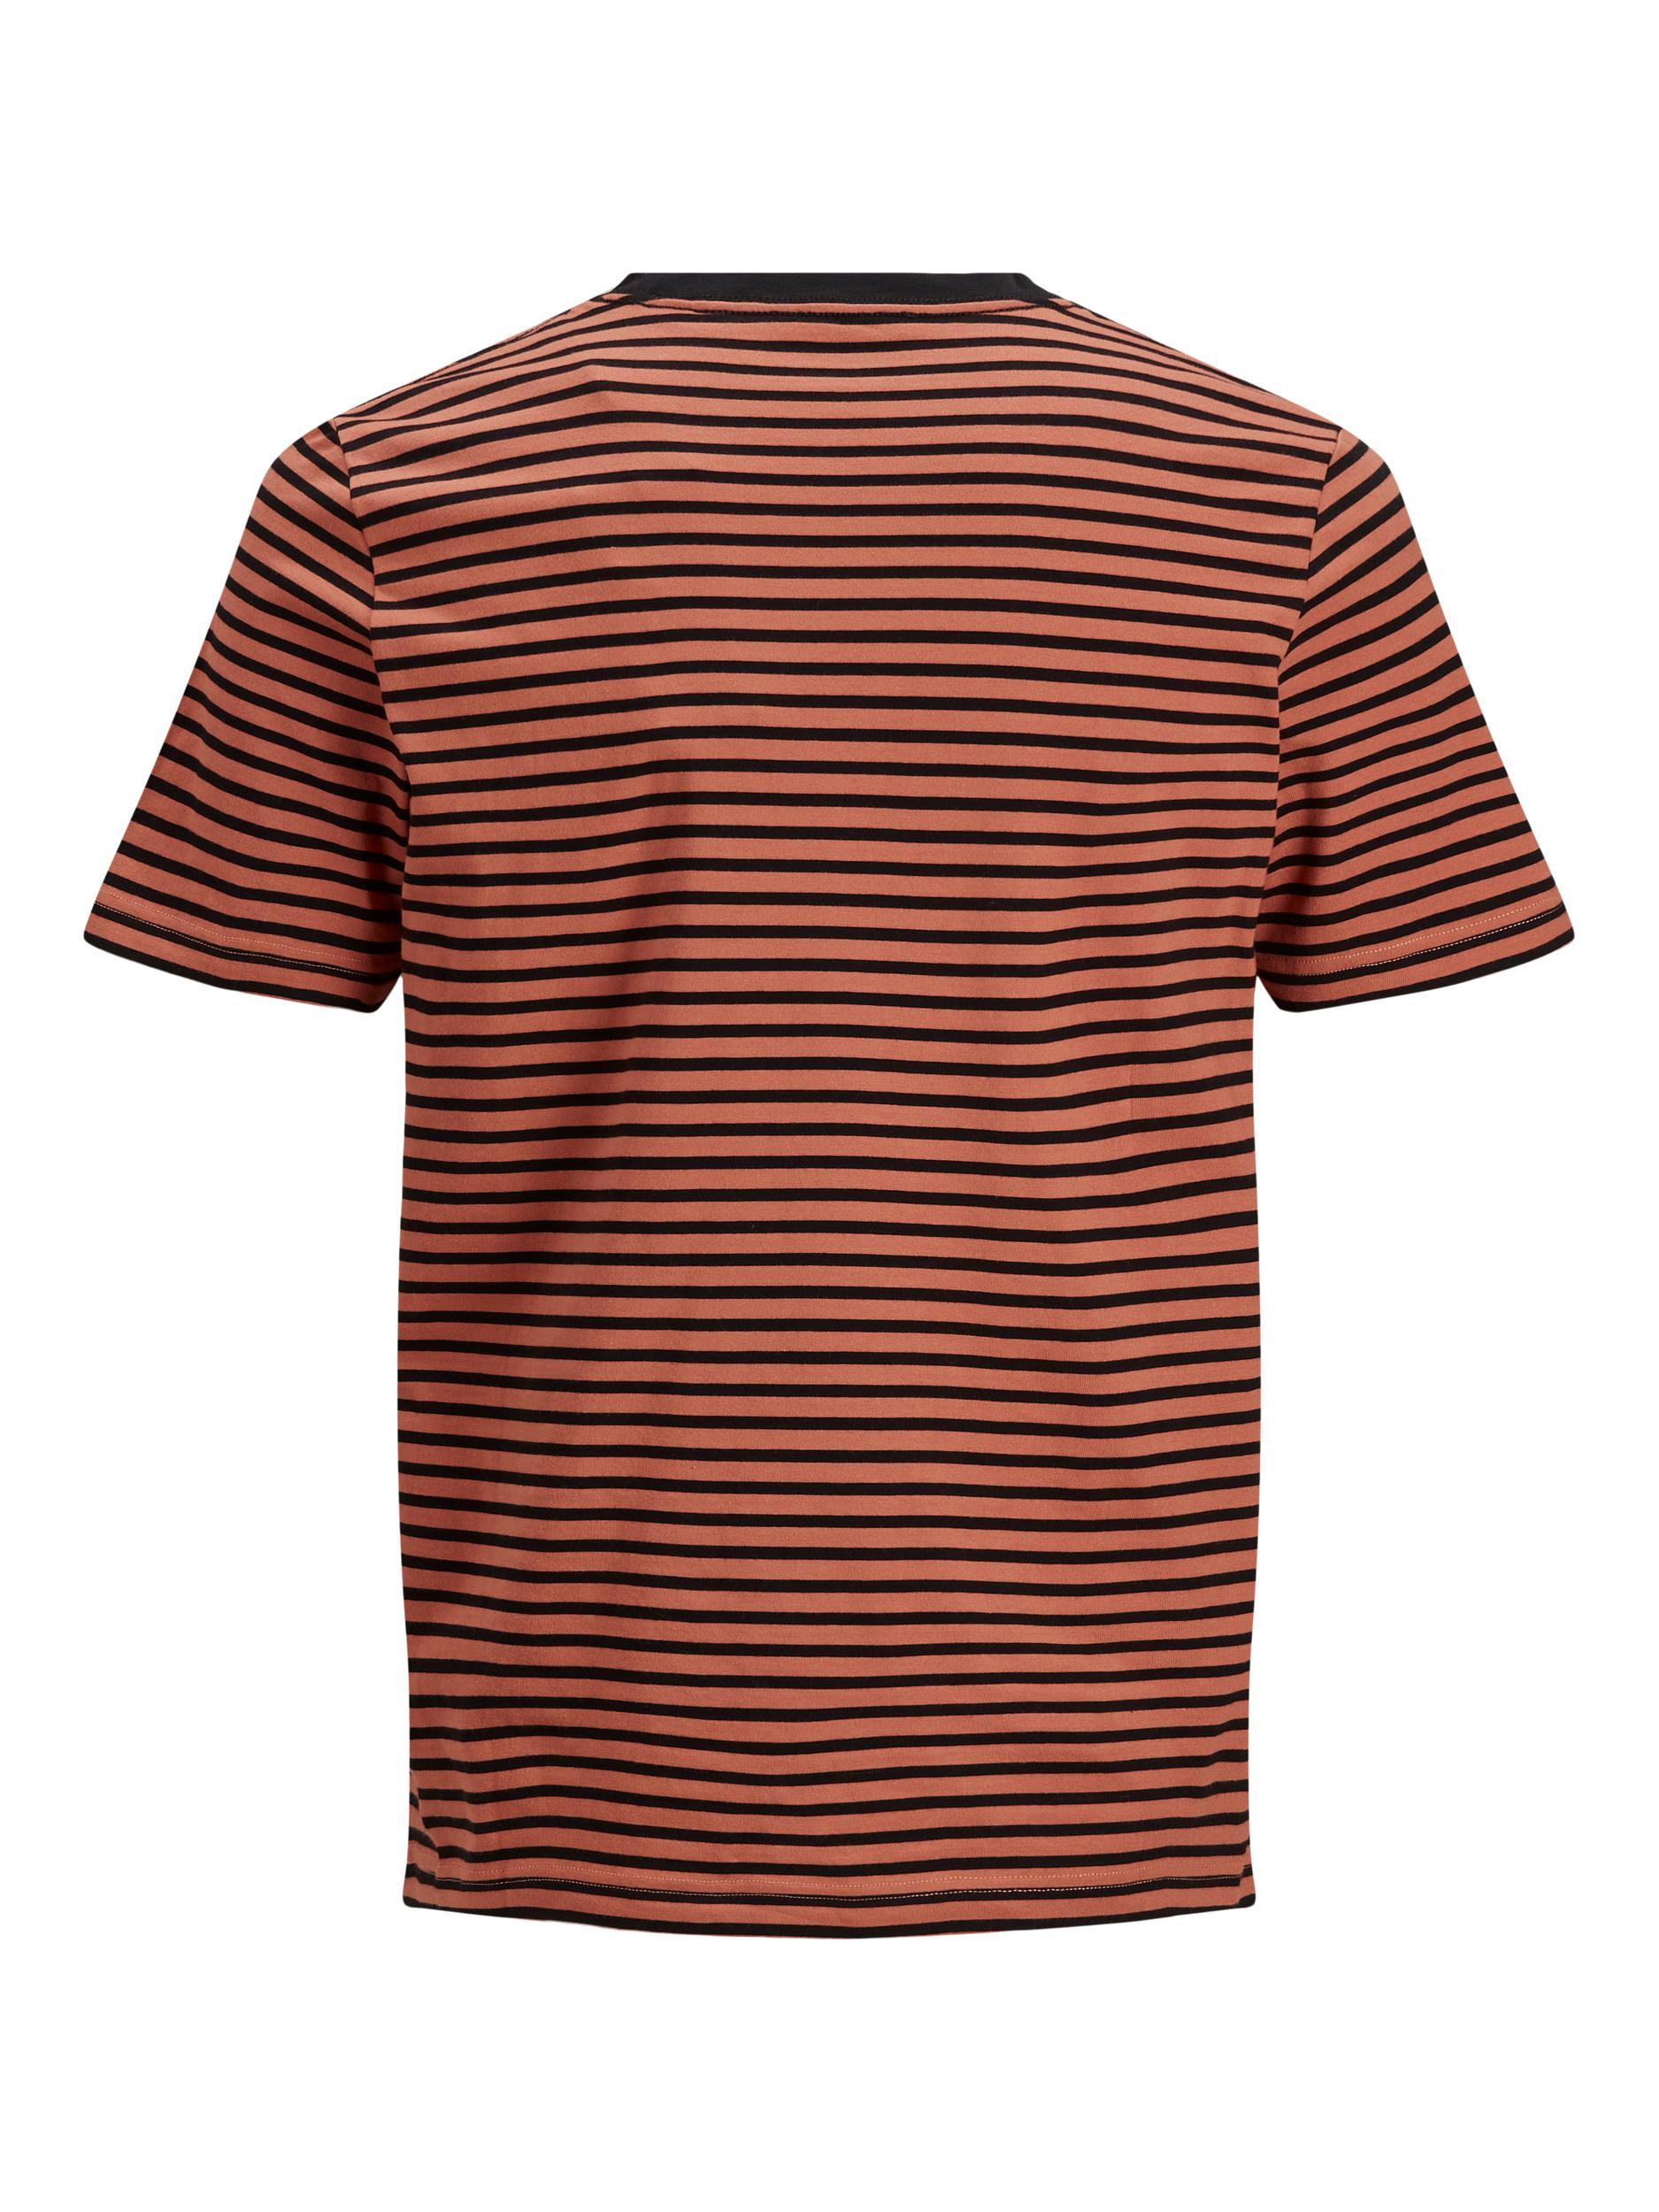 Jack & Jones blastudio t-shirt, mecca orange, x-large